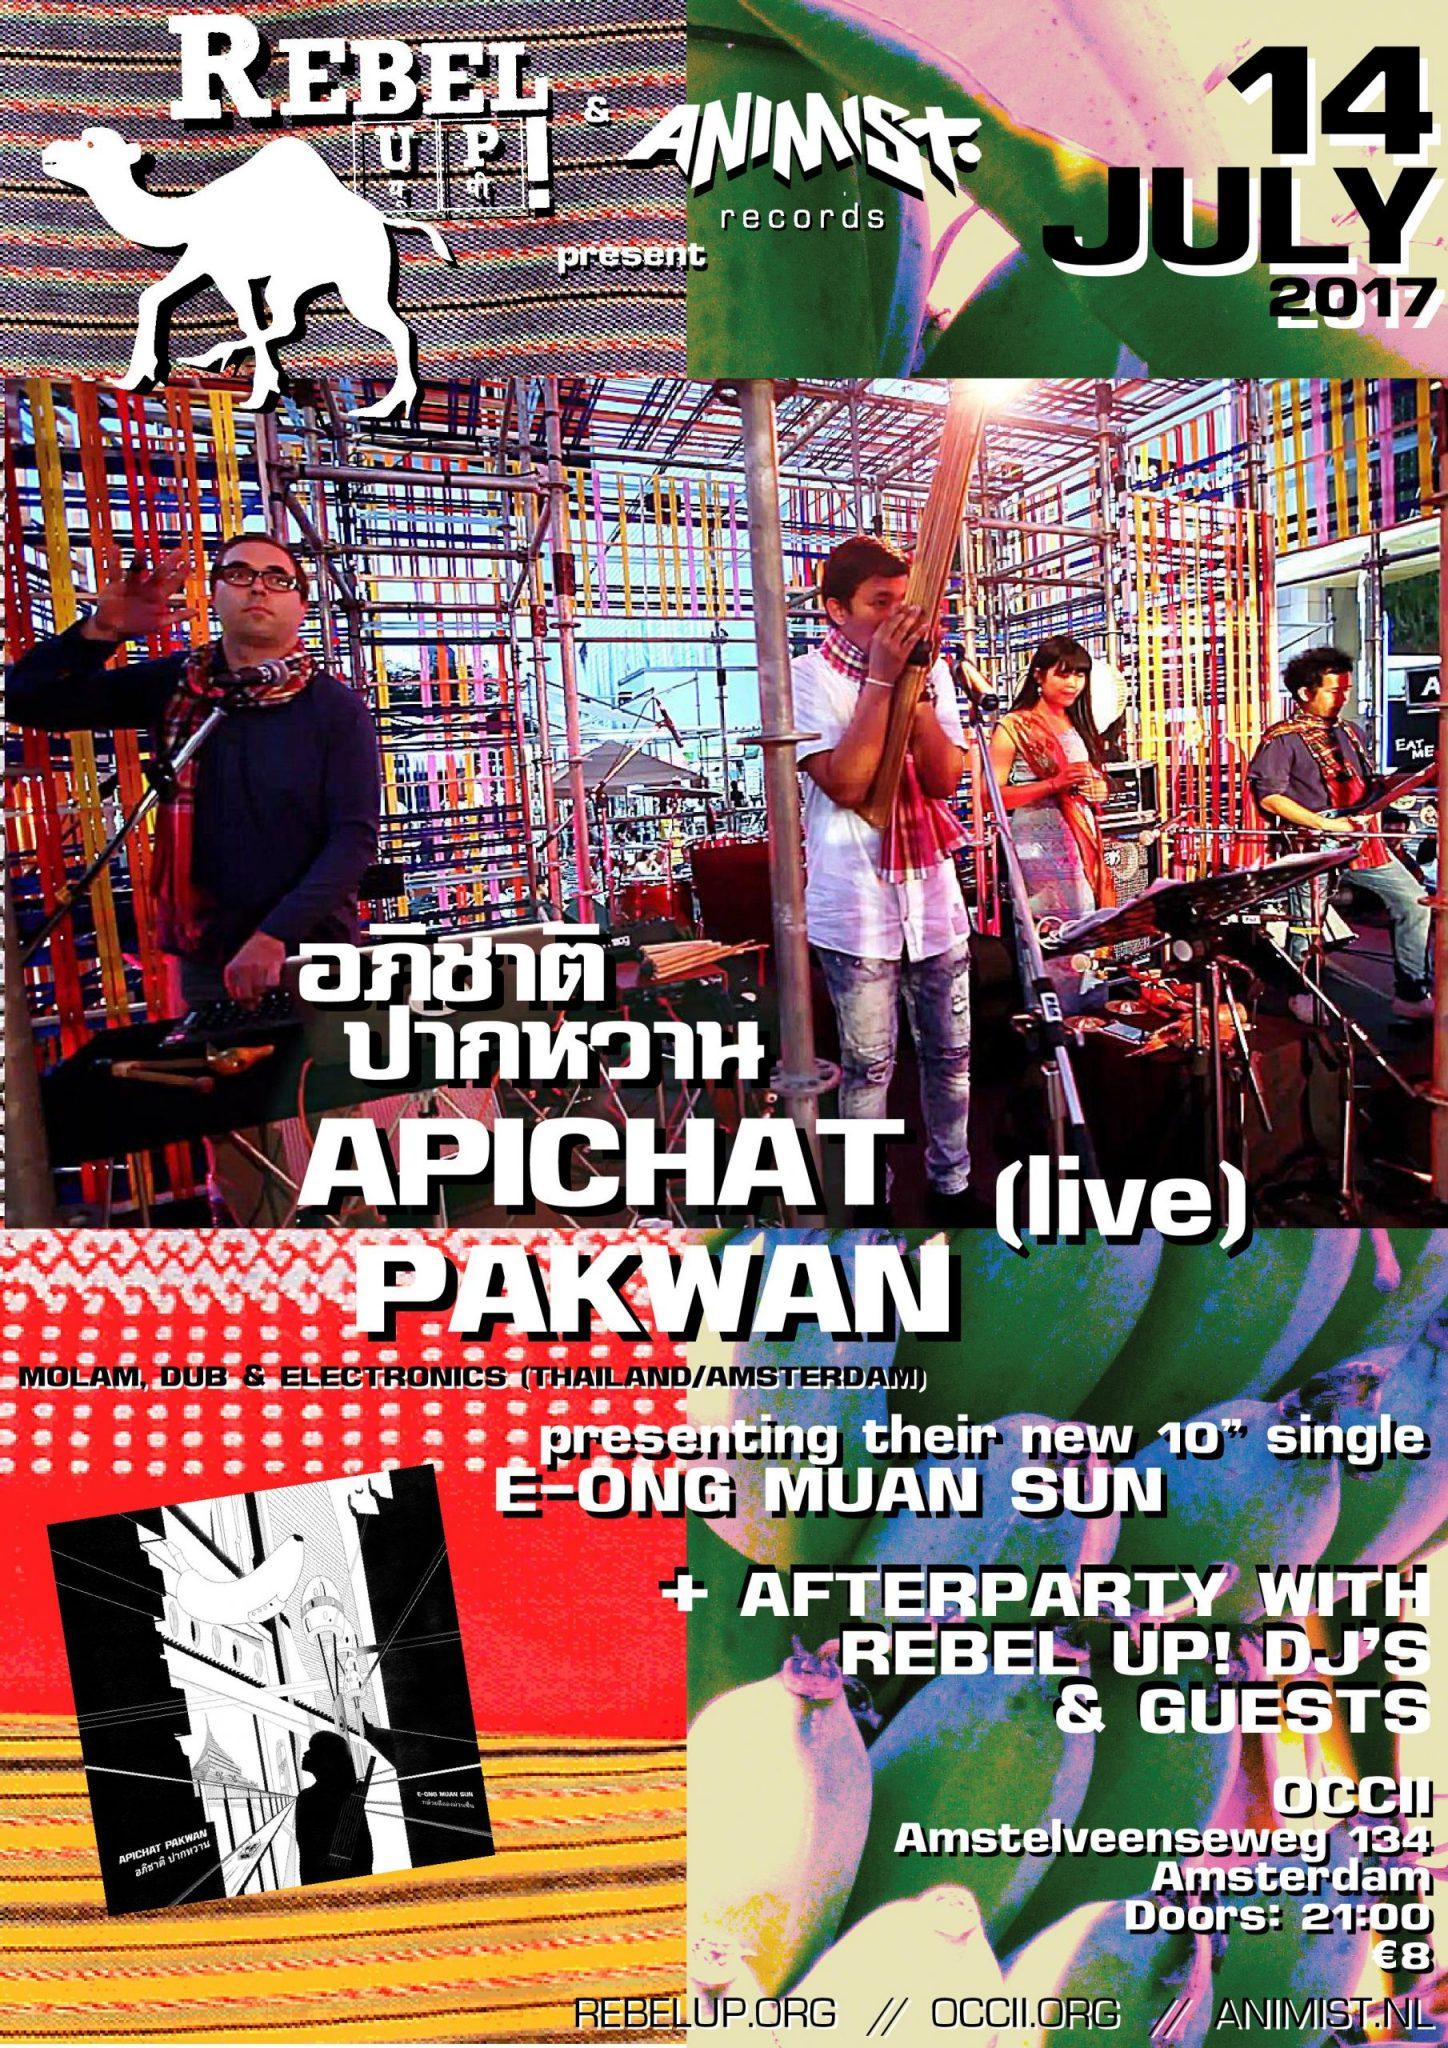 APICHAT PAKWAN (TH/NL) + DJ PINCHADO (AR) + REBEL UP! DJ'S